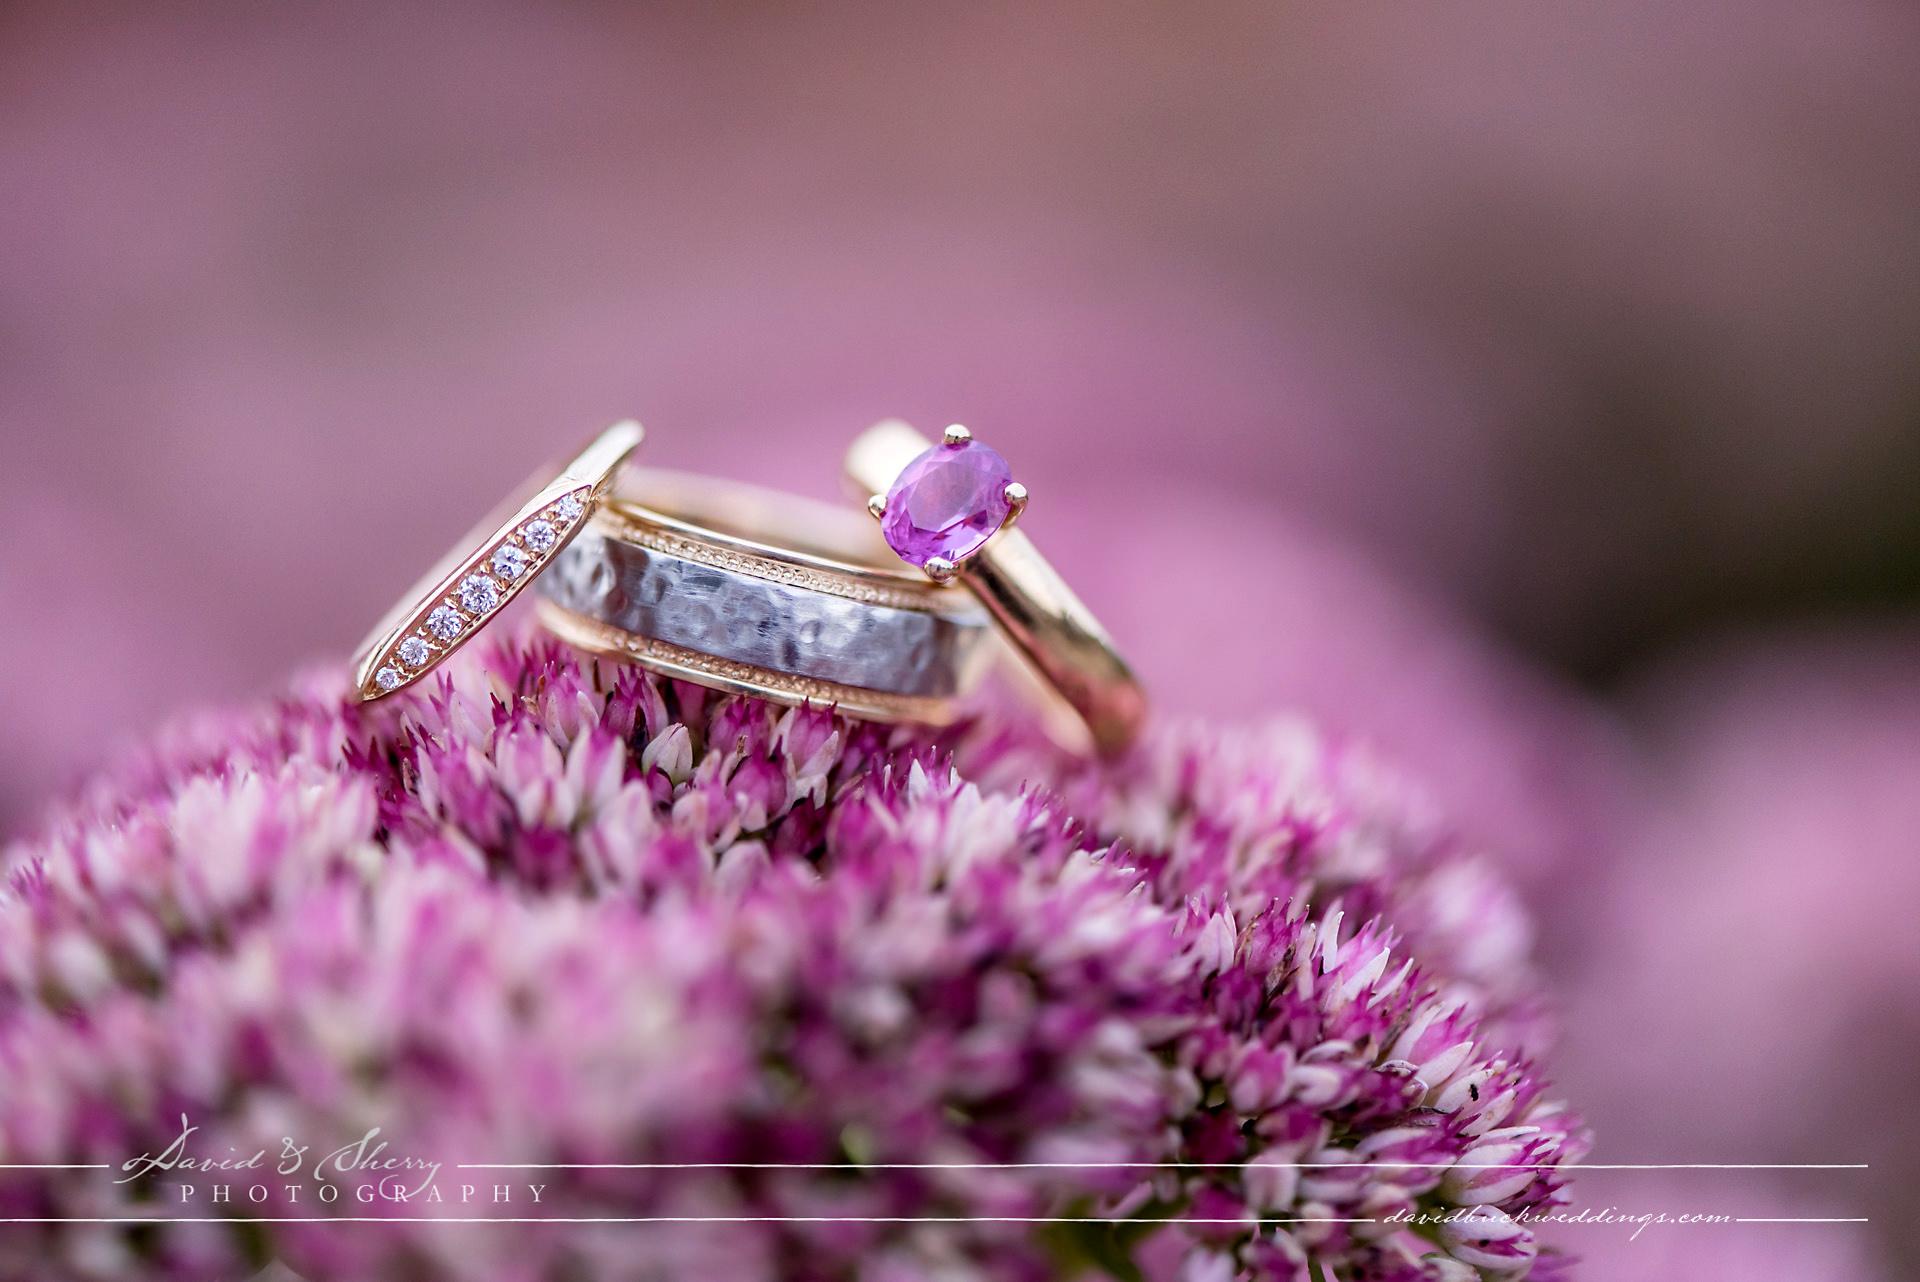 Cobble_Beach_Wedding_Photography_028